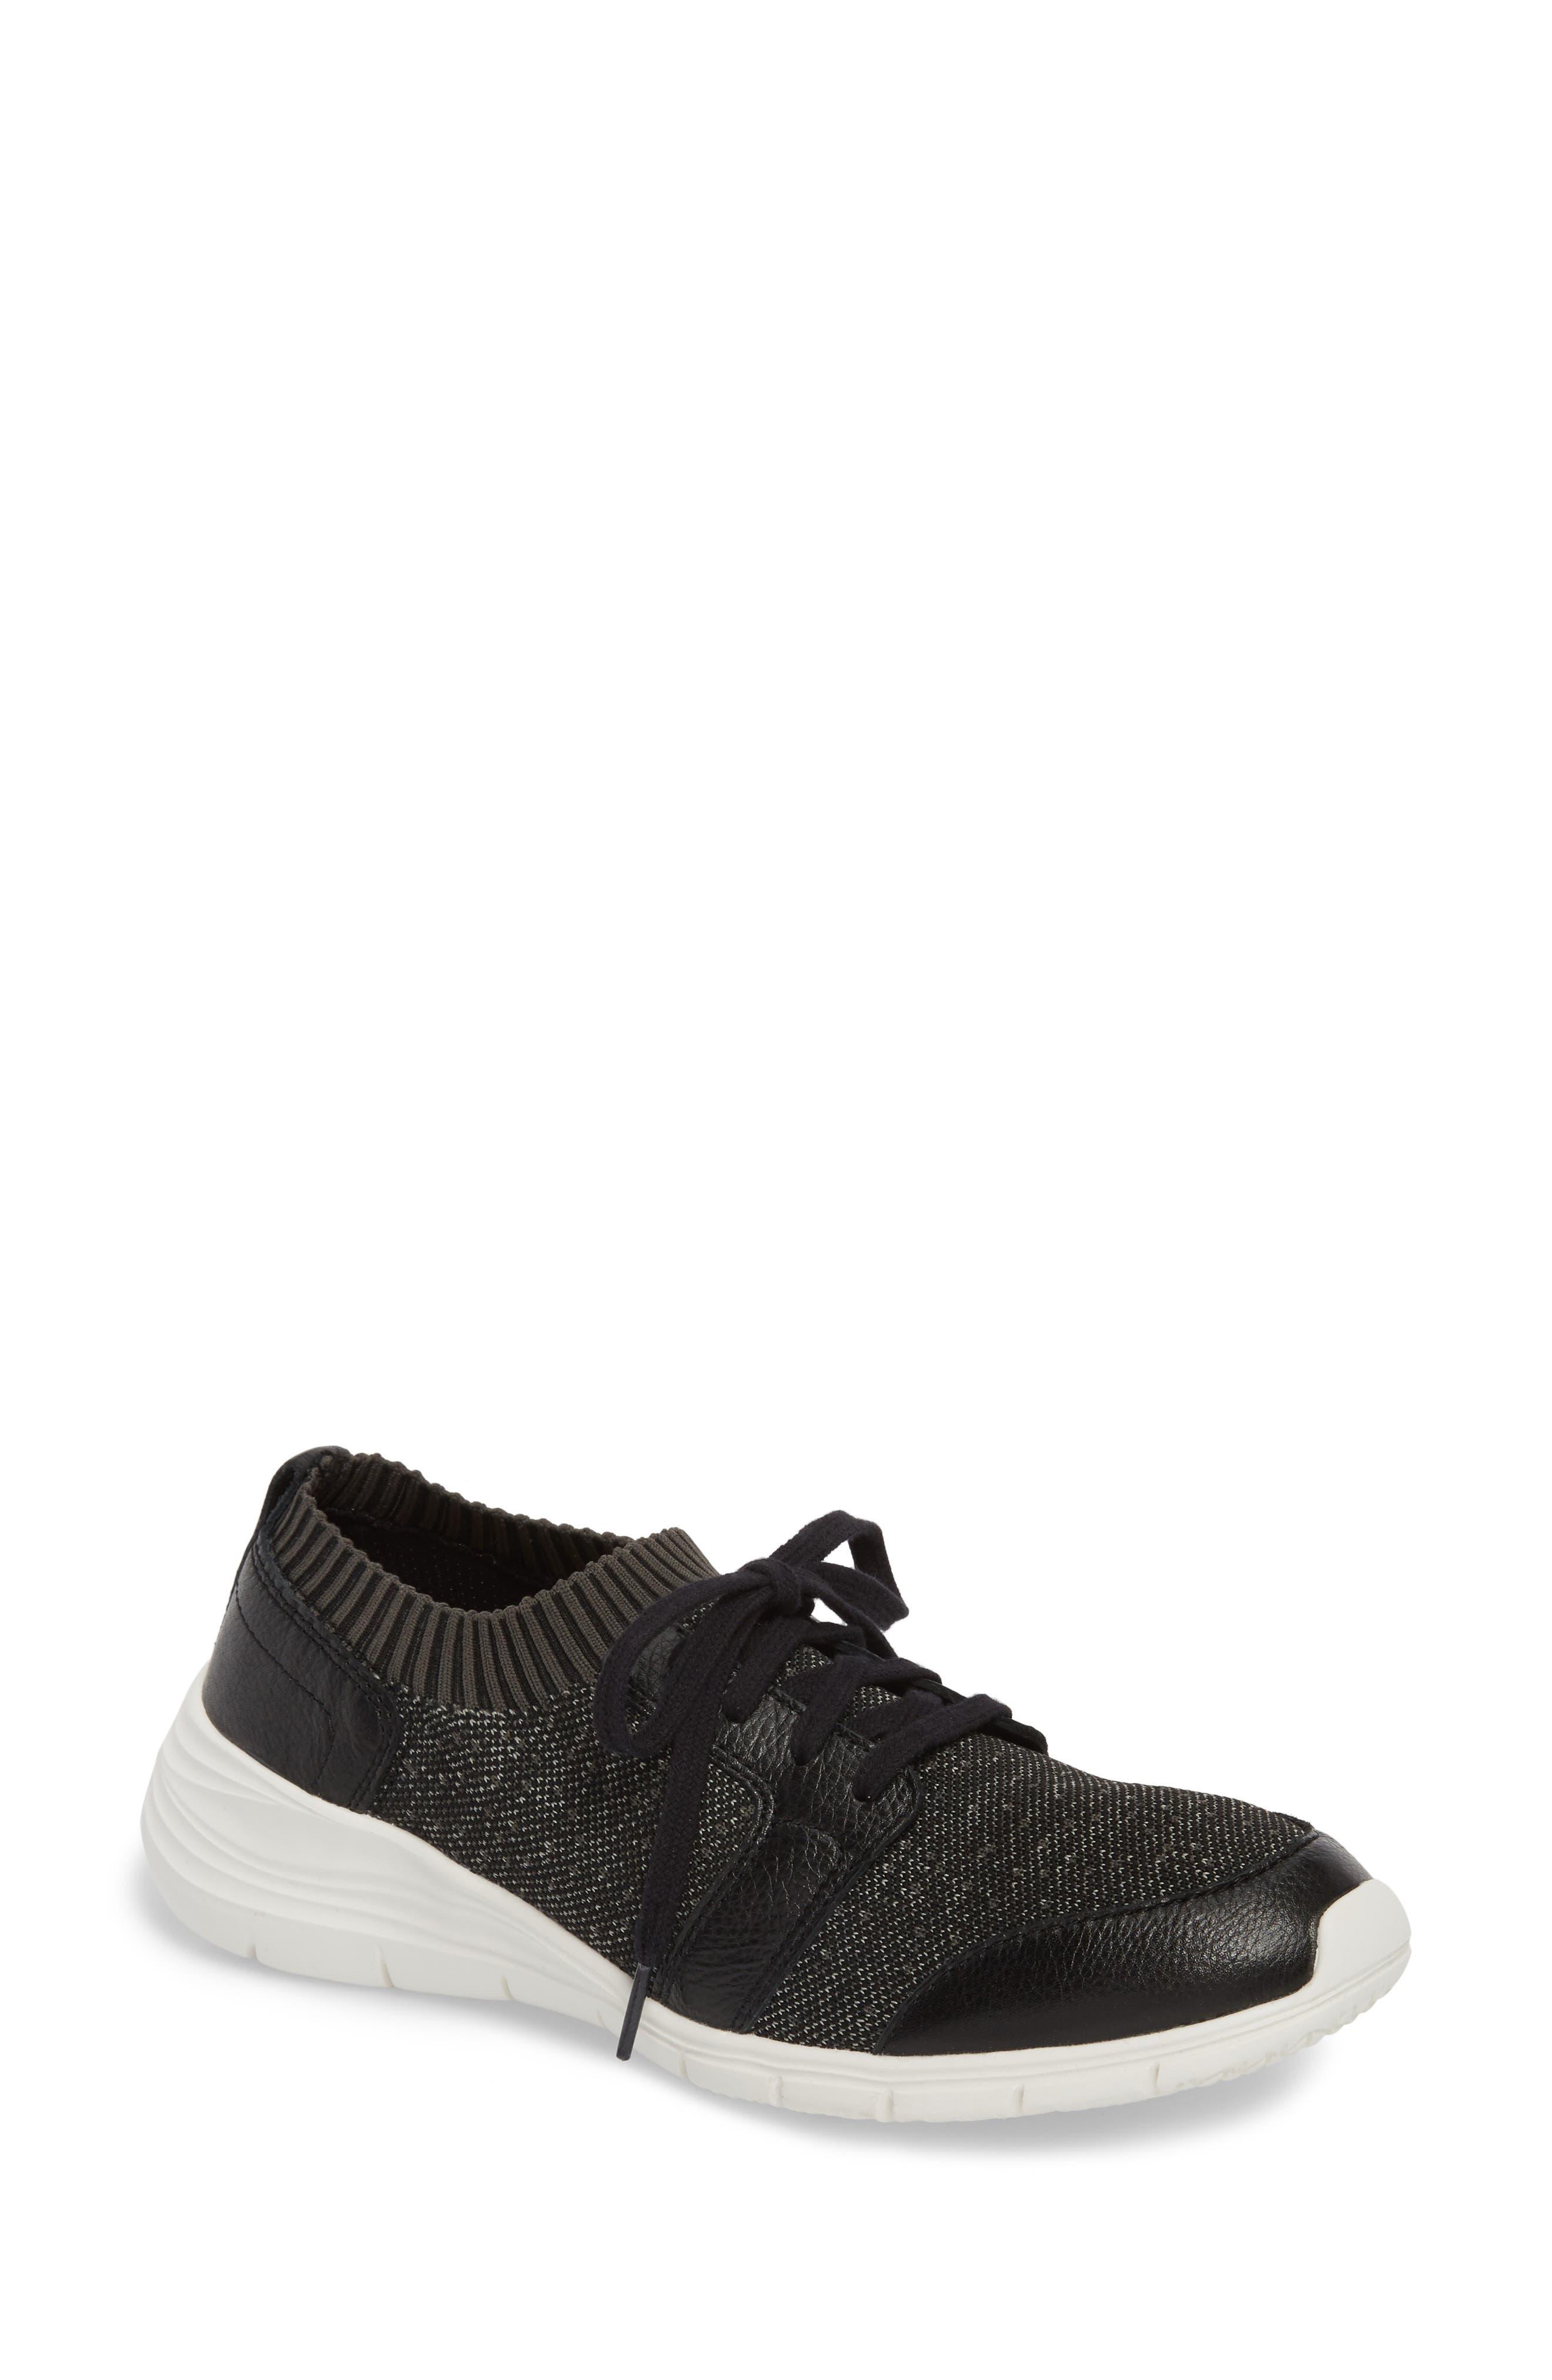 Cypress Knit Sneaker,                             Main thumbnail 1, color,                             BLACK FABRIC